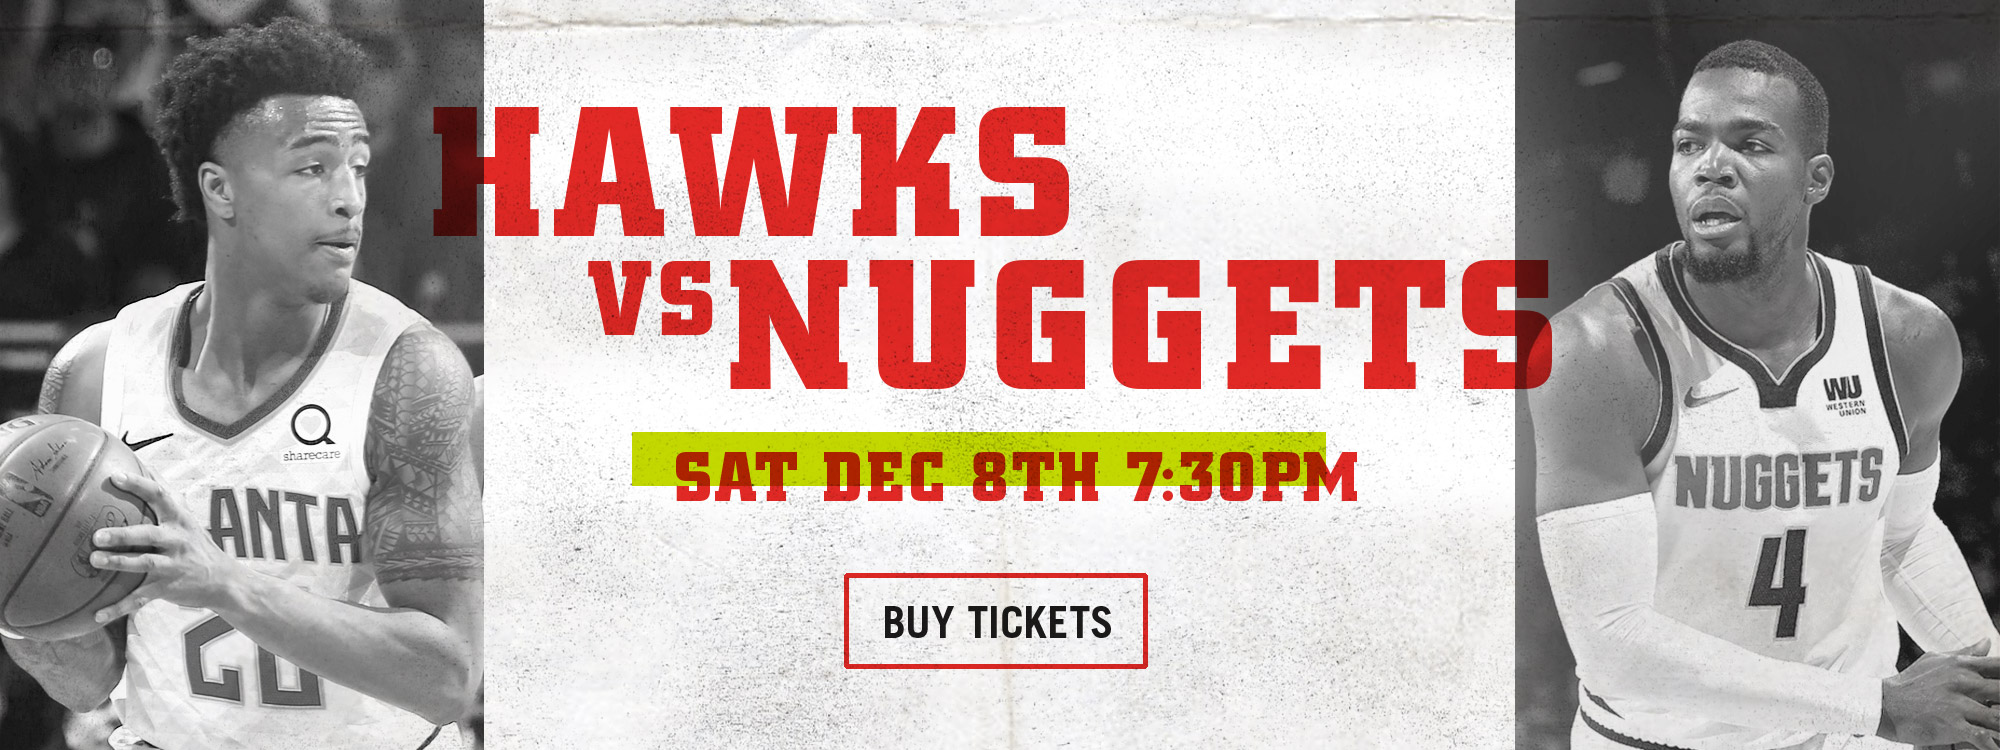 HAWKS vs. NUGGETS